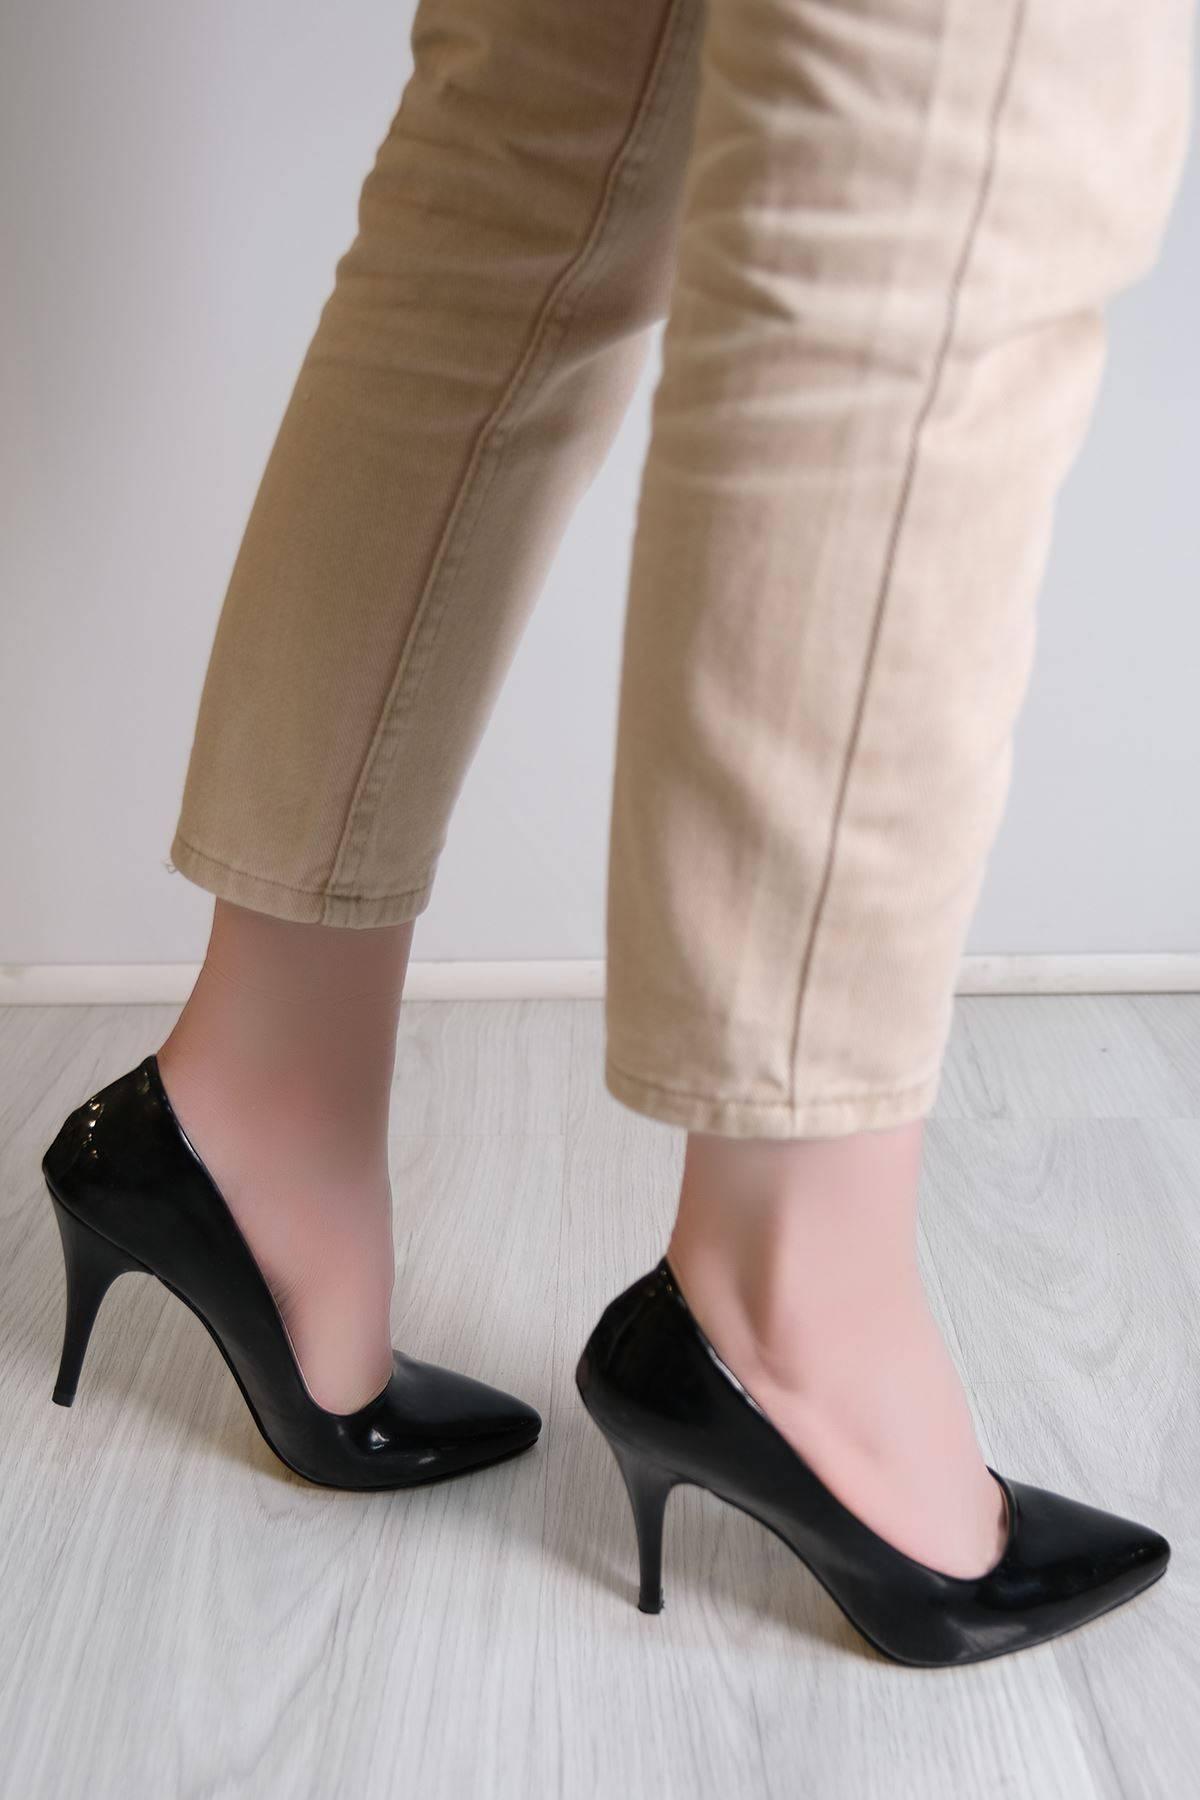 9 Cm Topuklu Ayakkabı Siyahrugan - 5177.264.